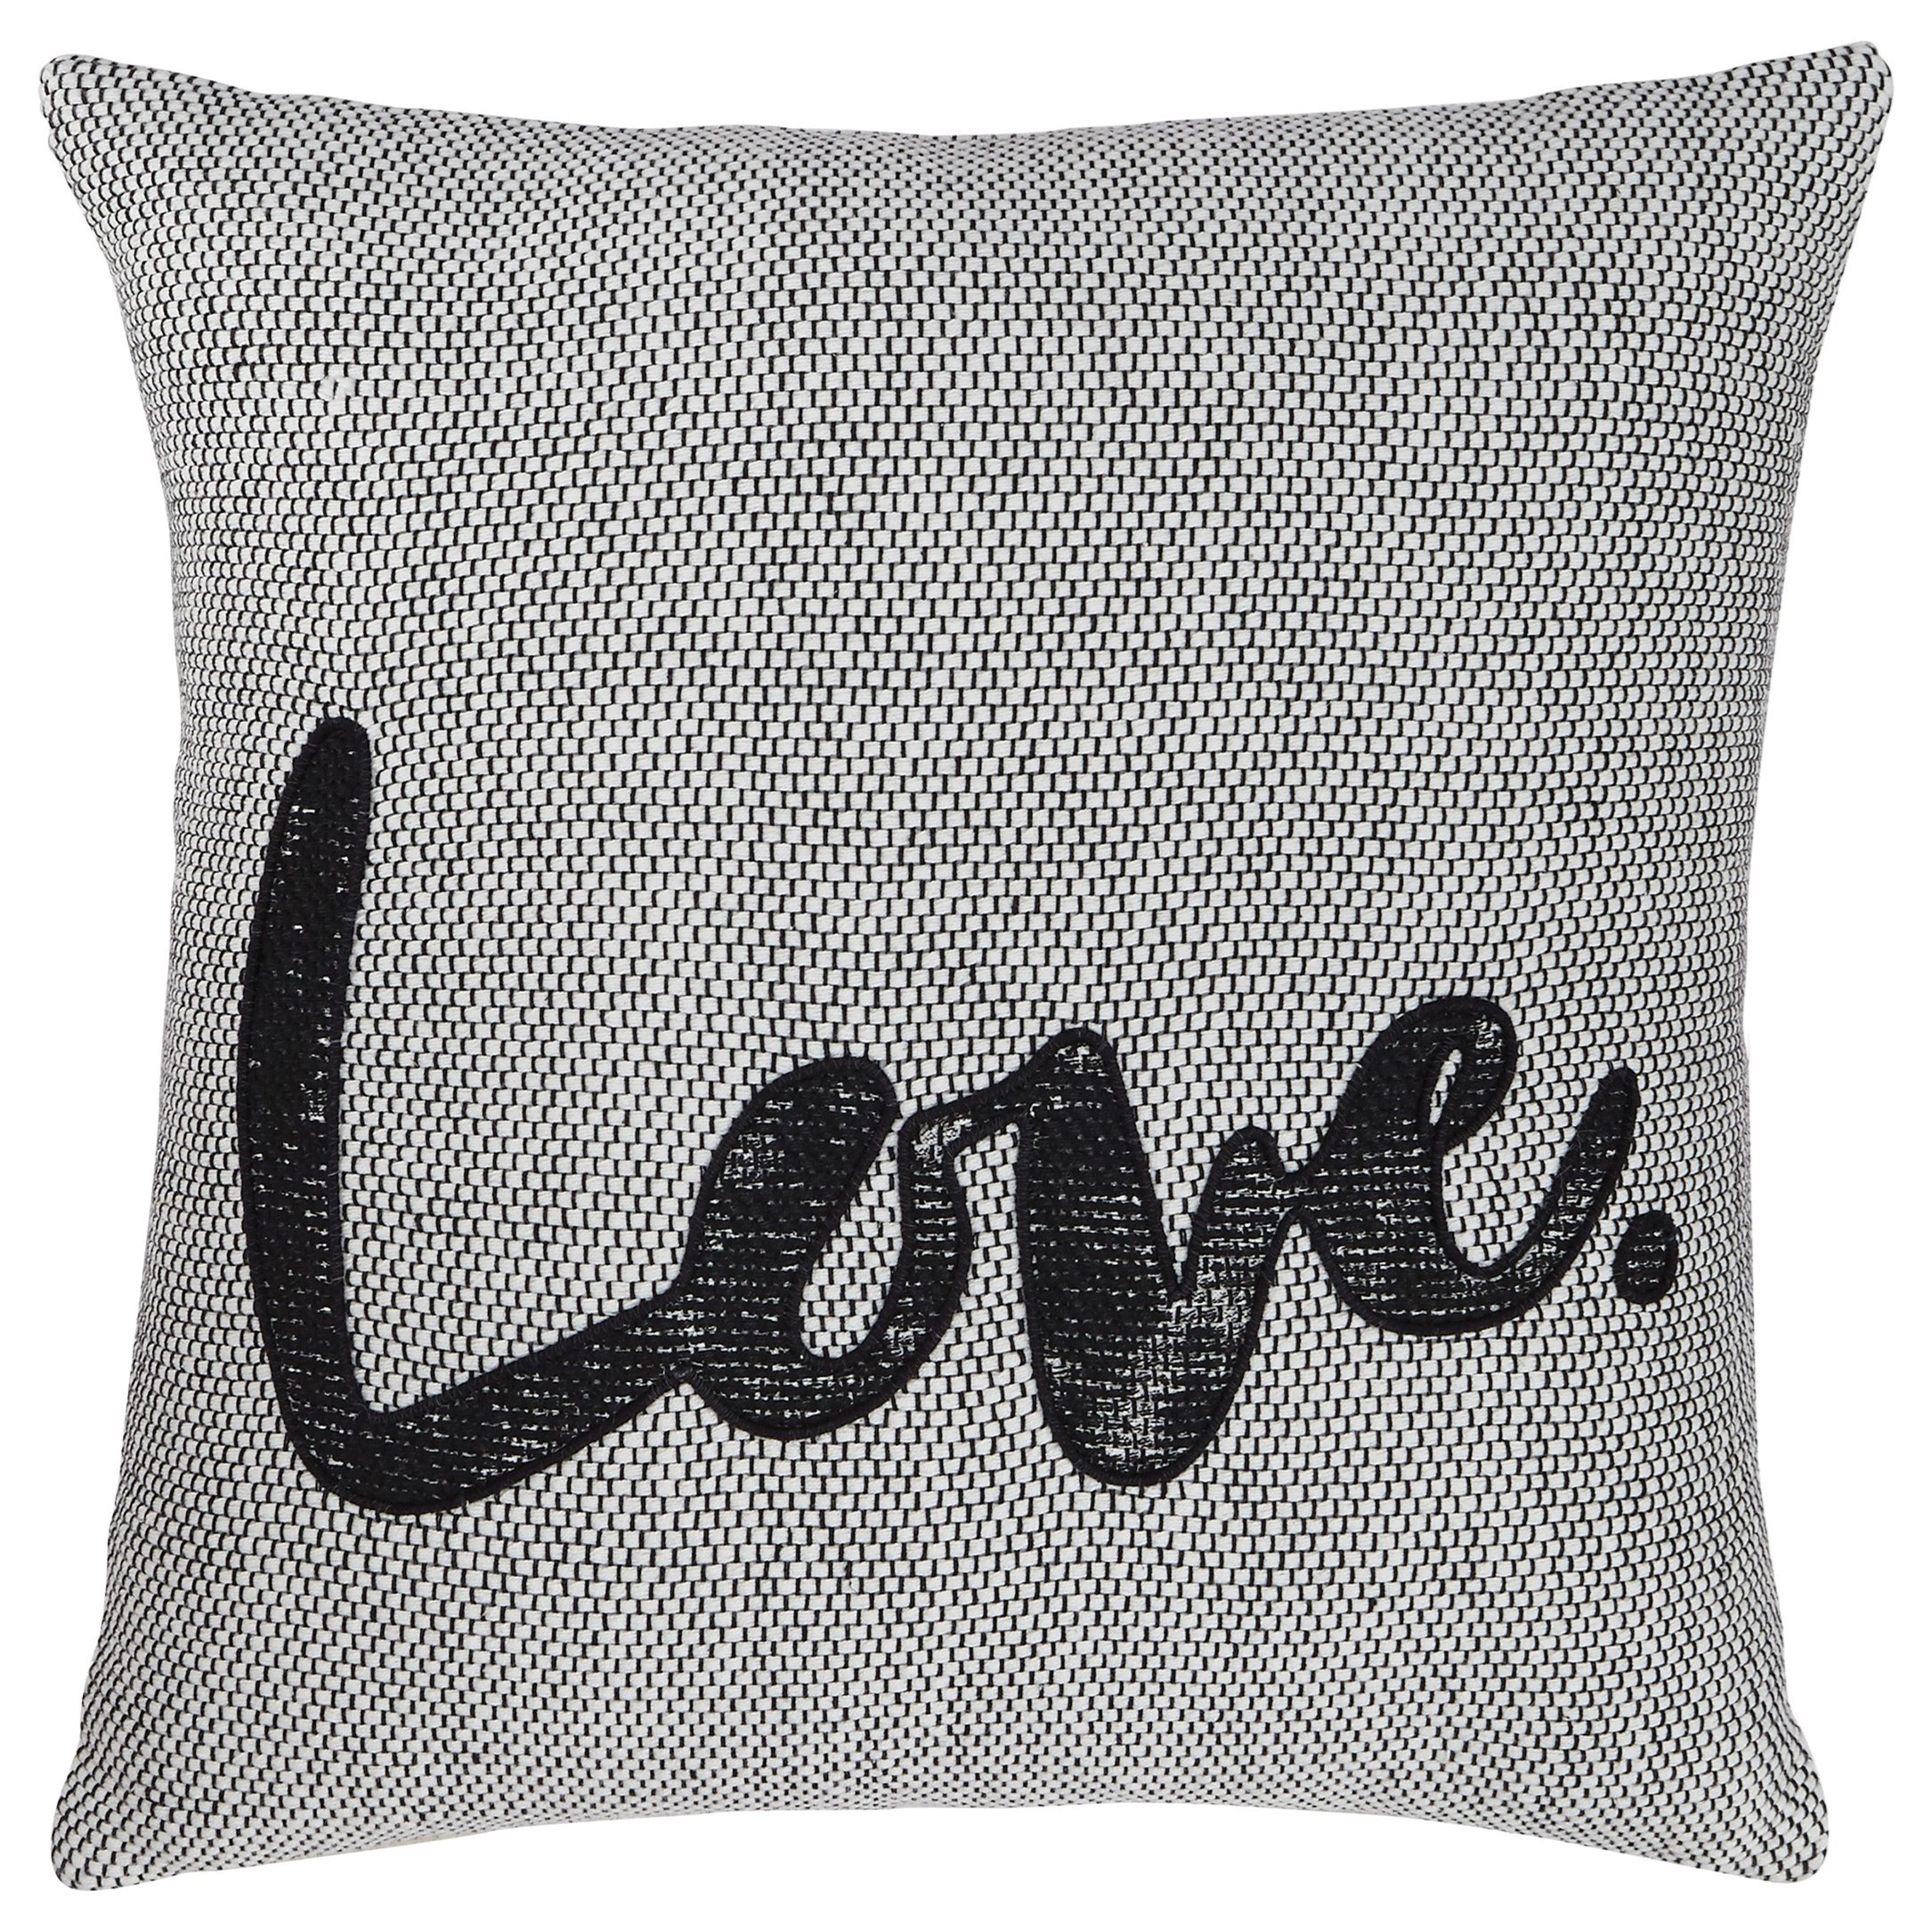 Pillows Mattia White/Black Pillow by Signature Design by Ashley at Furniture Barn